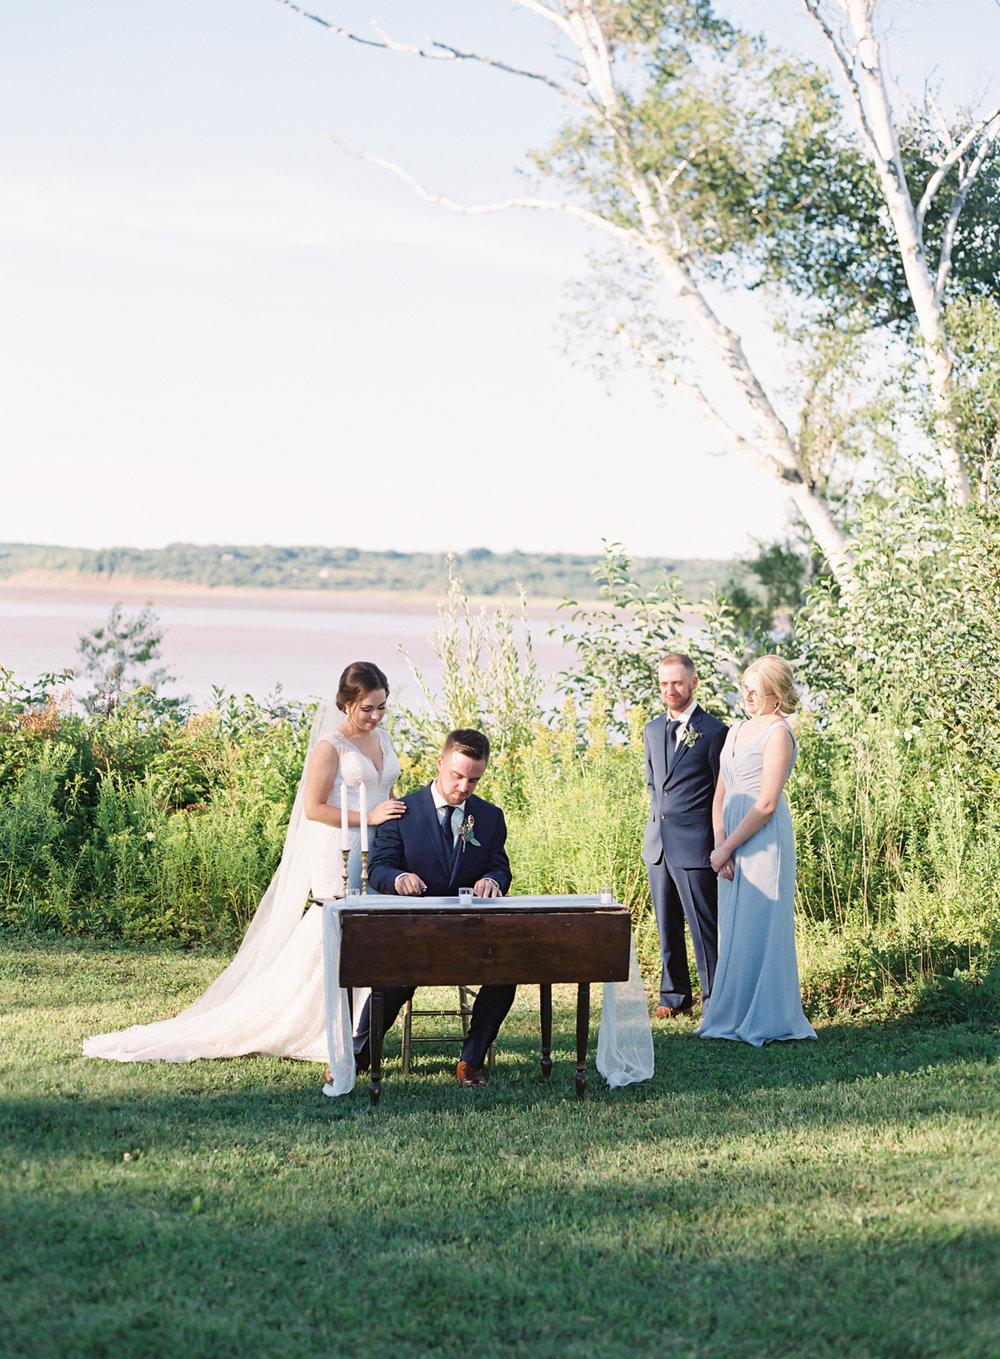 Jacqueline Anne Photography - Nova Scotia Backyard Wedding-71.jpg